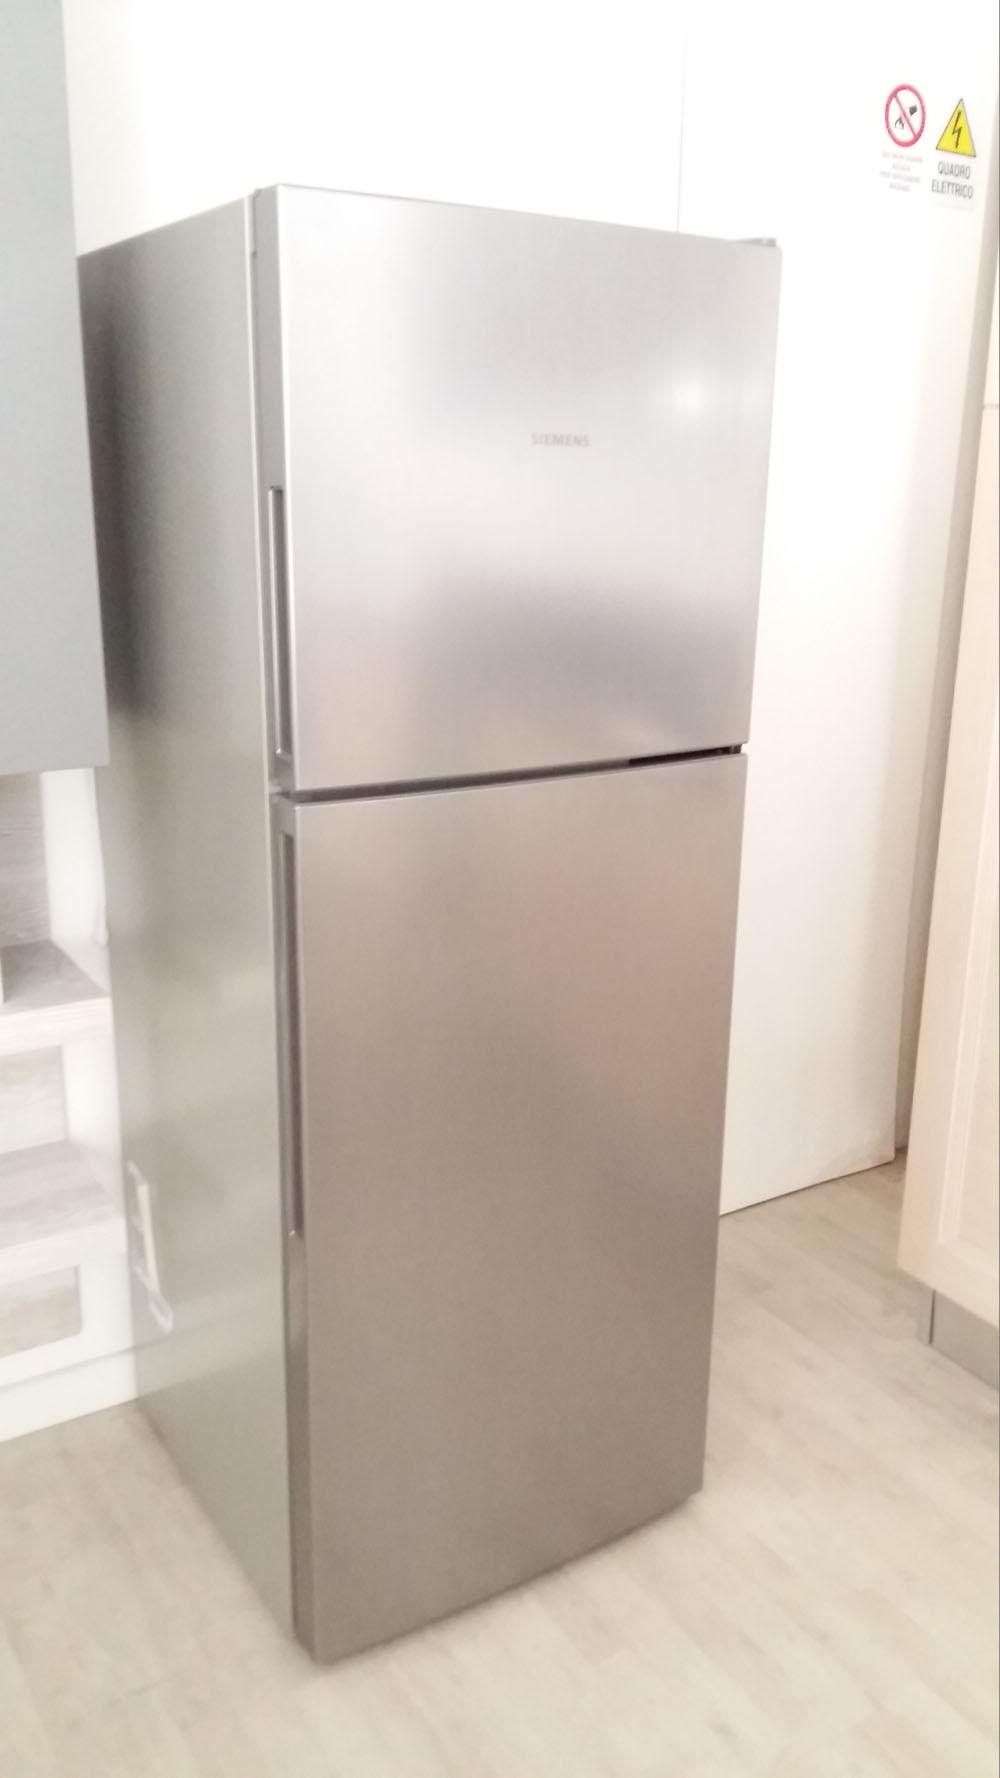 Offerte frigoriferi siemens kd29vvl30 scontato del 54 for Frigoriferi profondita